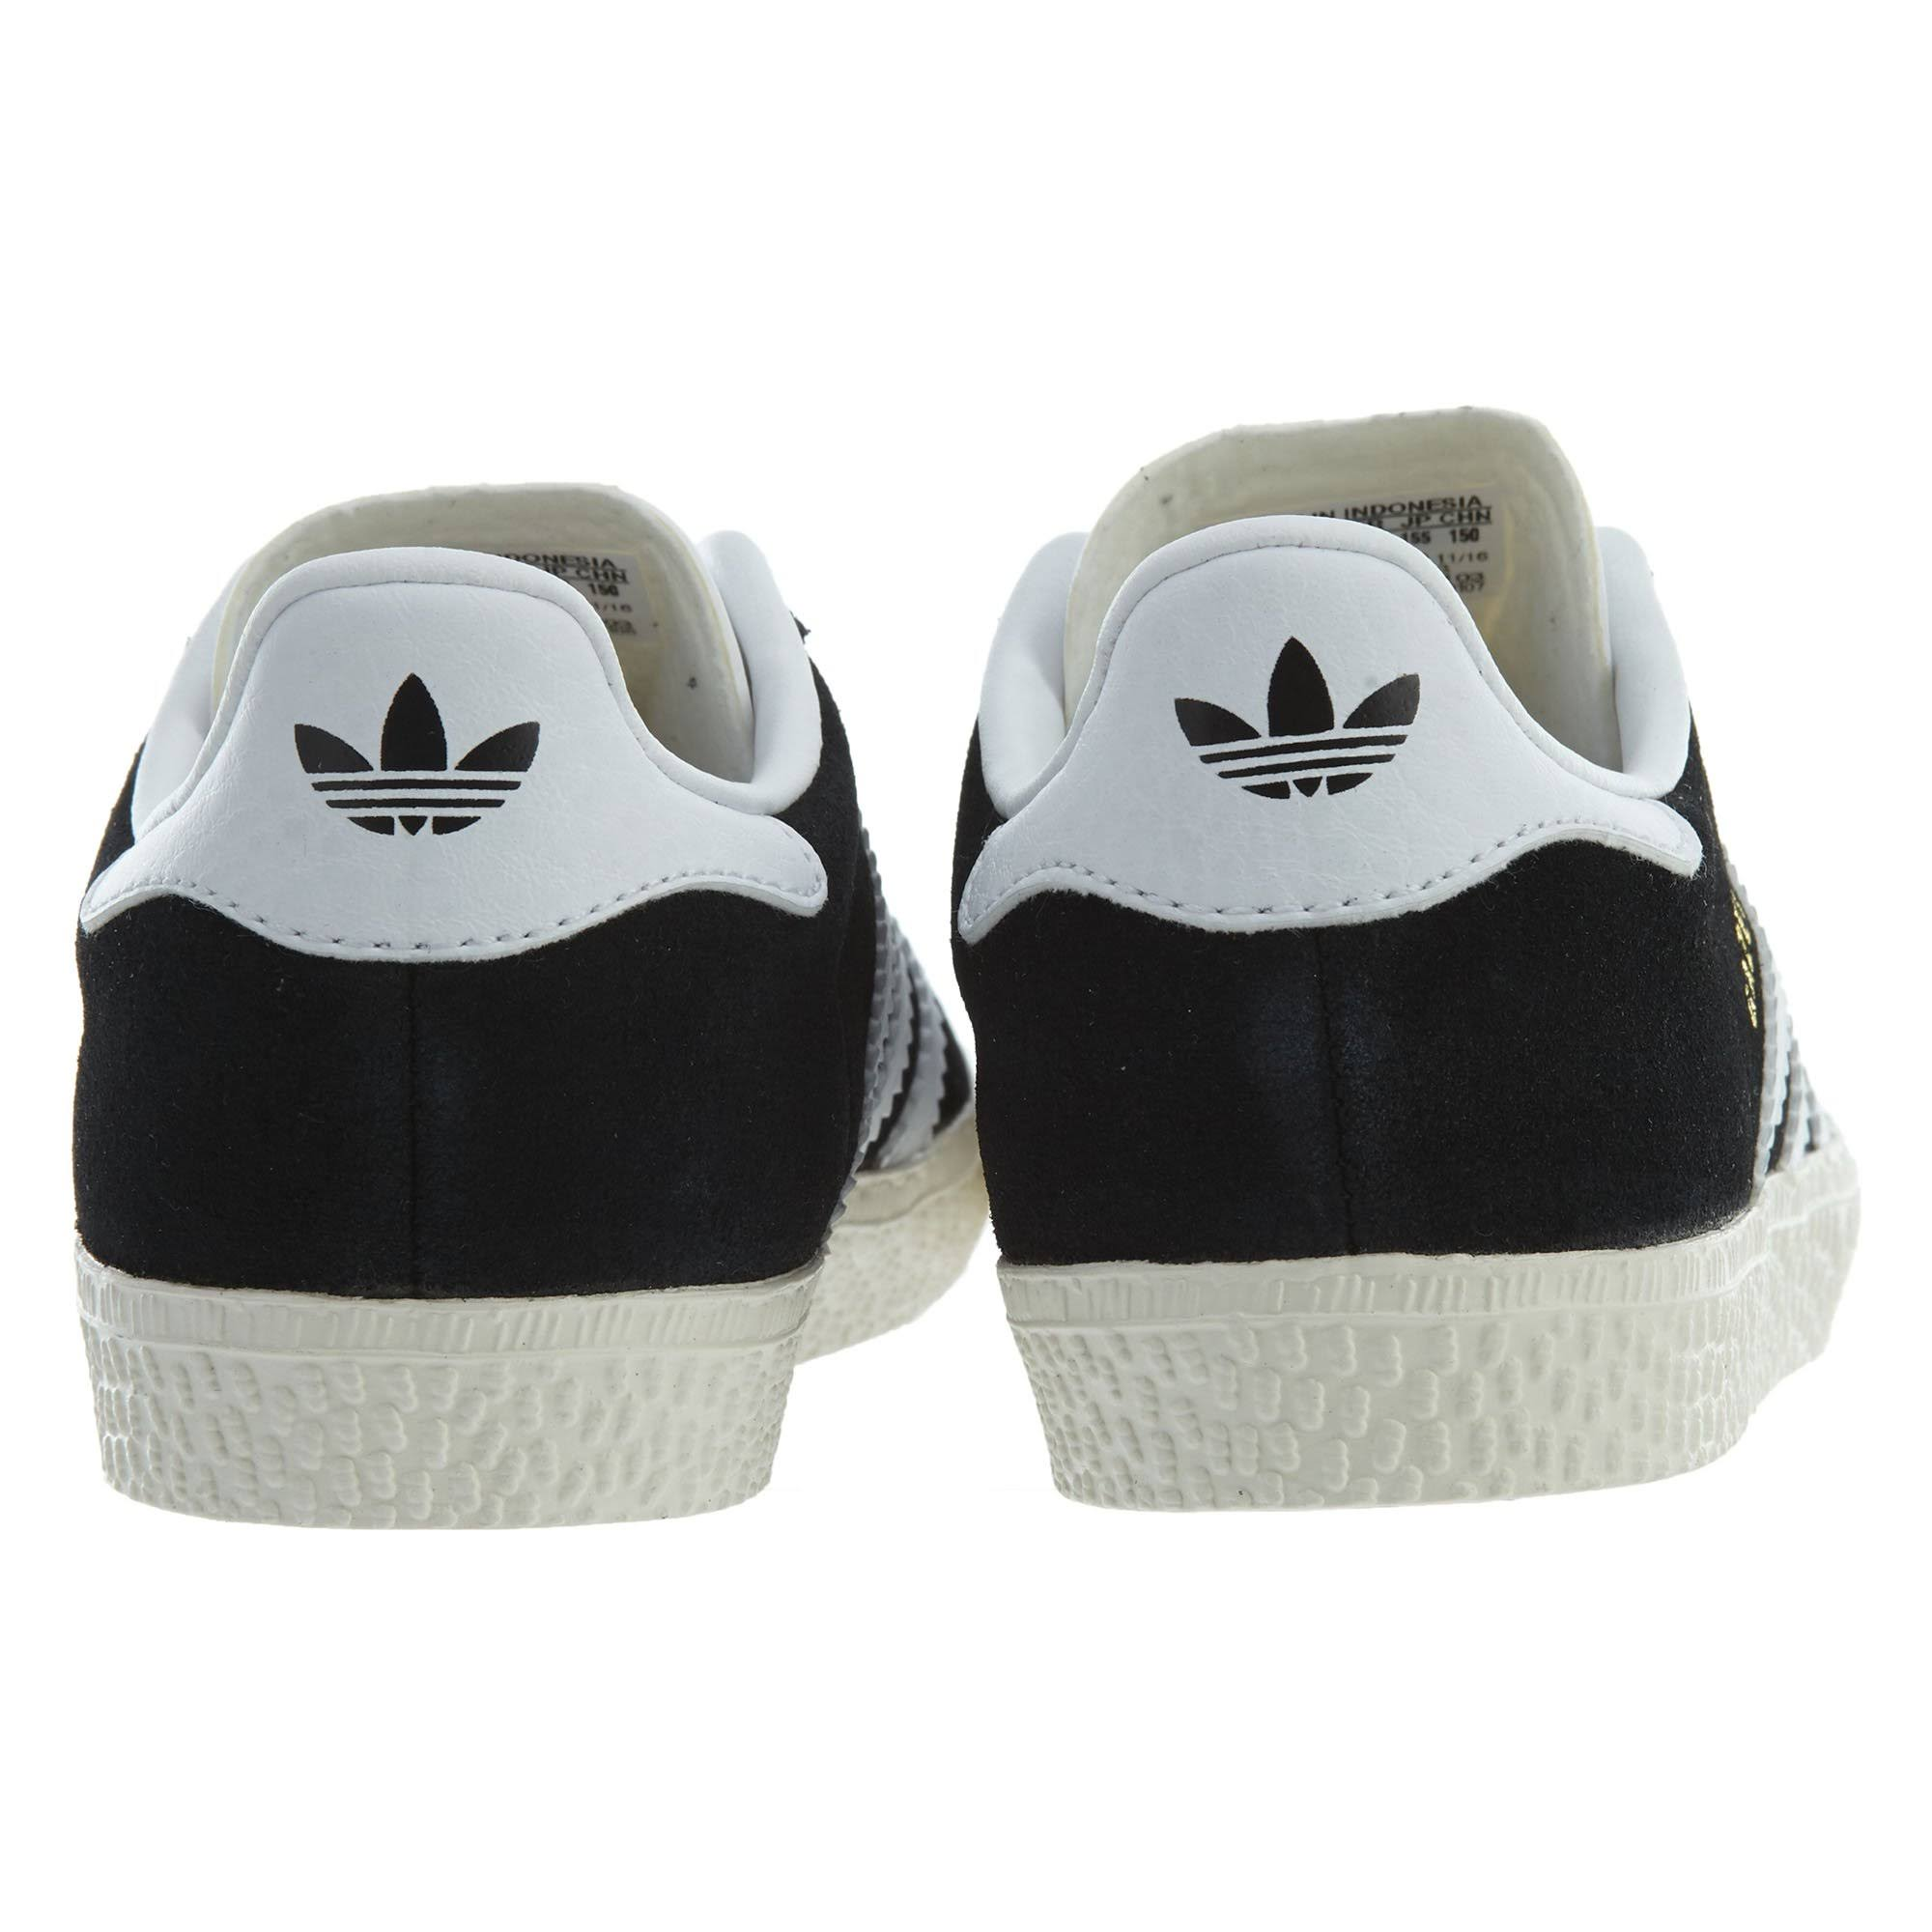 Size Toddler Originals 9 Adidas 2 Bb2513 Boys Gazelle Shoes nI0dqdTOw